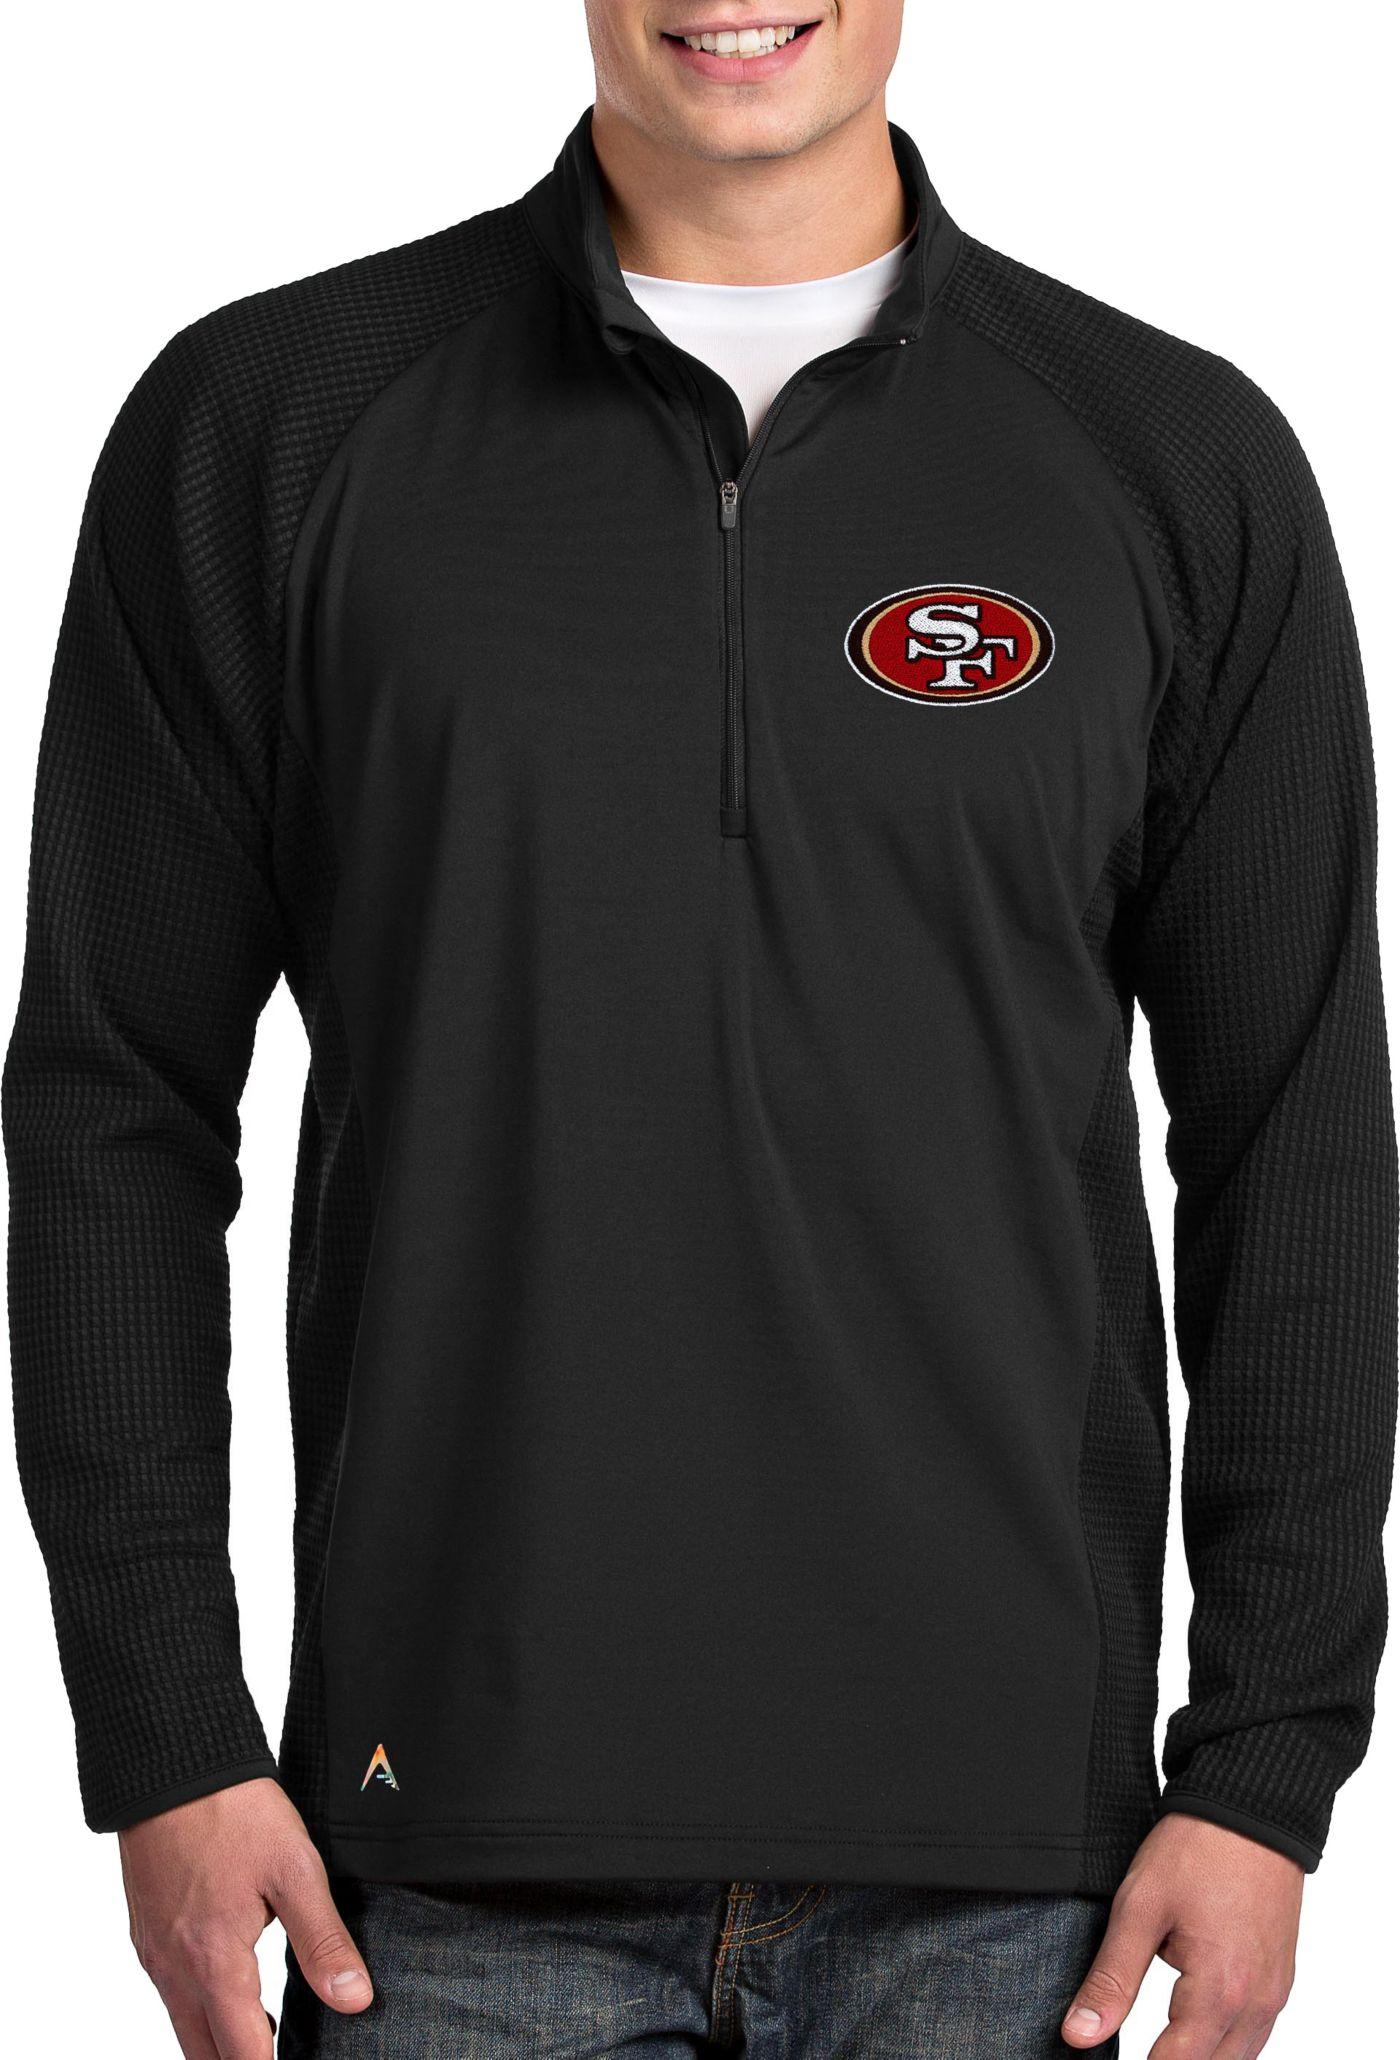 Antigua Men's San Francisco 49ers Sonar Black Quarter-Zip Pullover